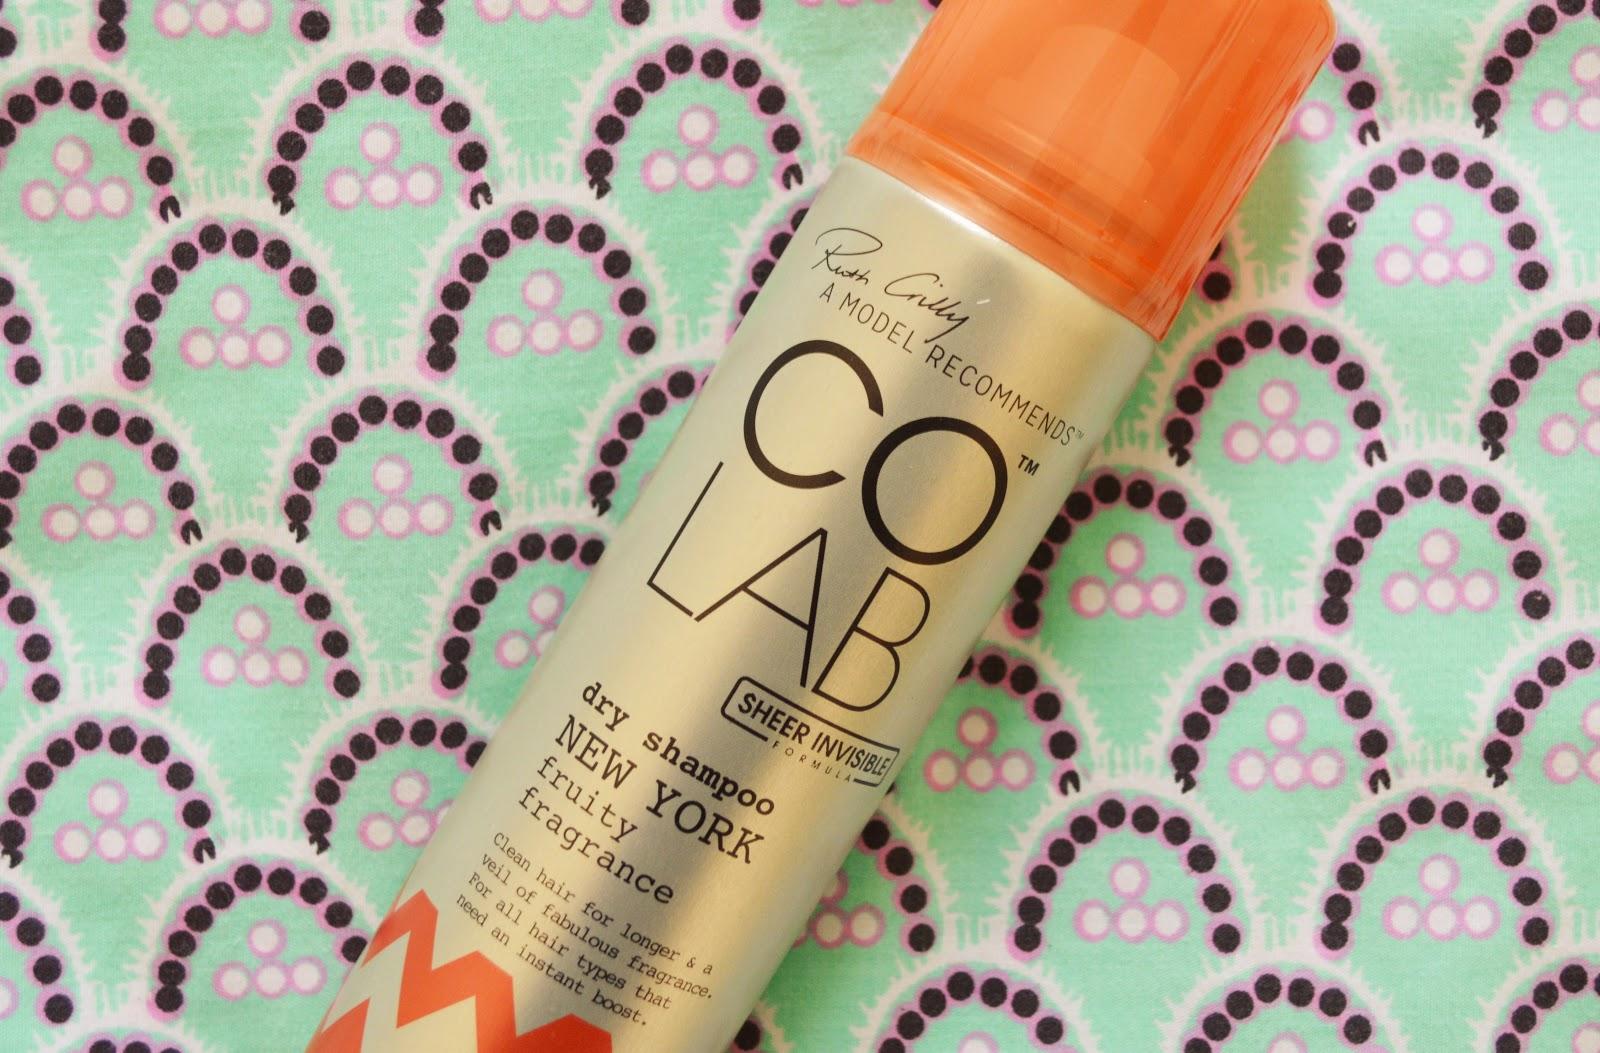 COLAB New York Dry Shampoo